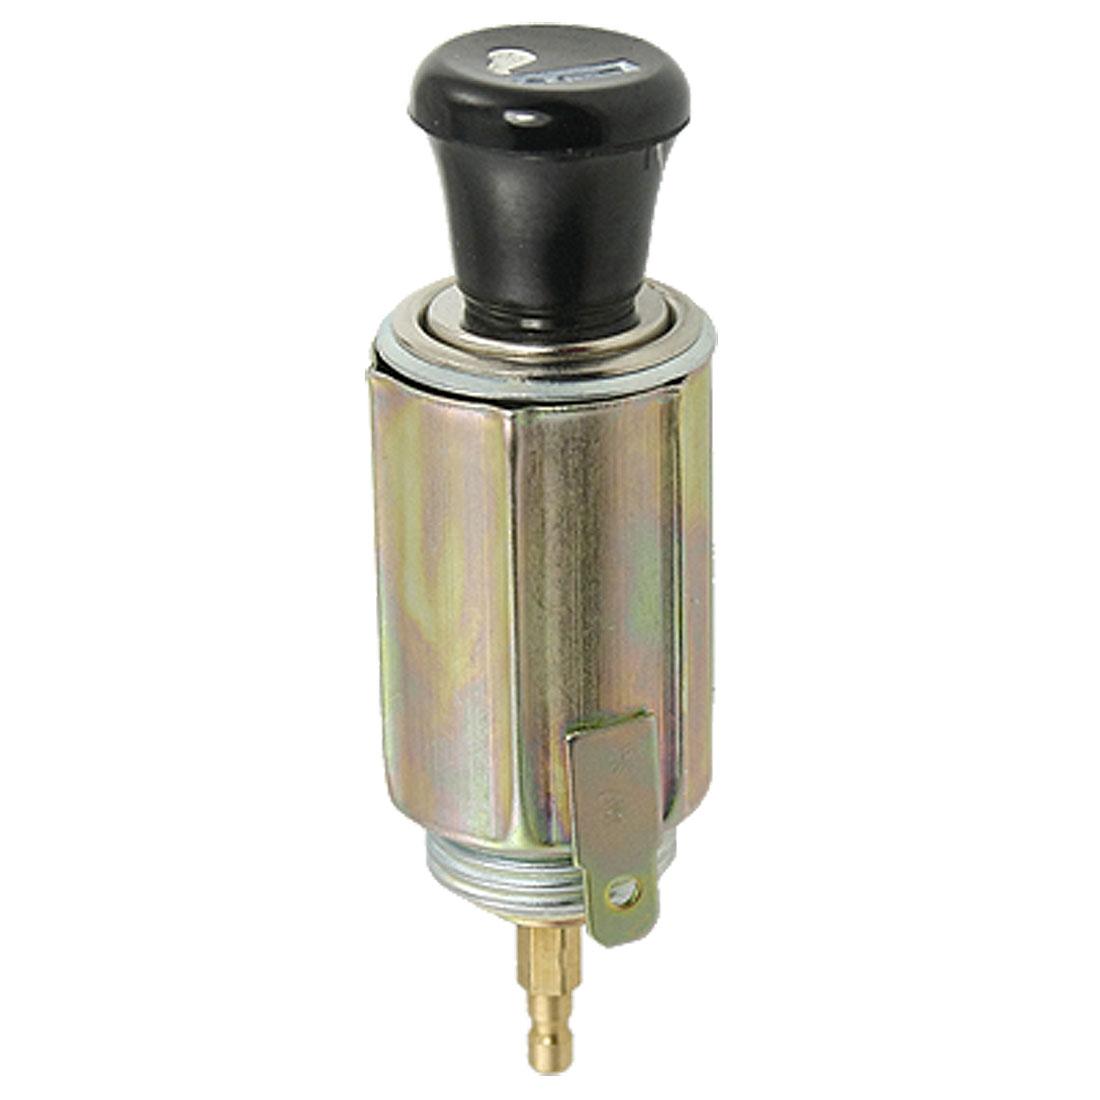 Universal DC 12V Car Auto Push Button Cigarette Lighter